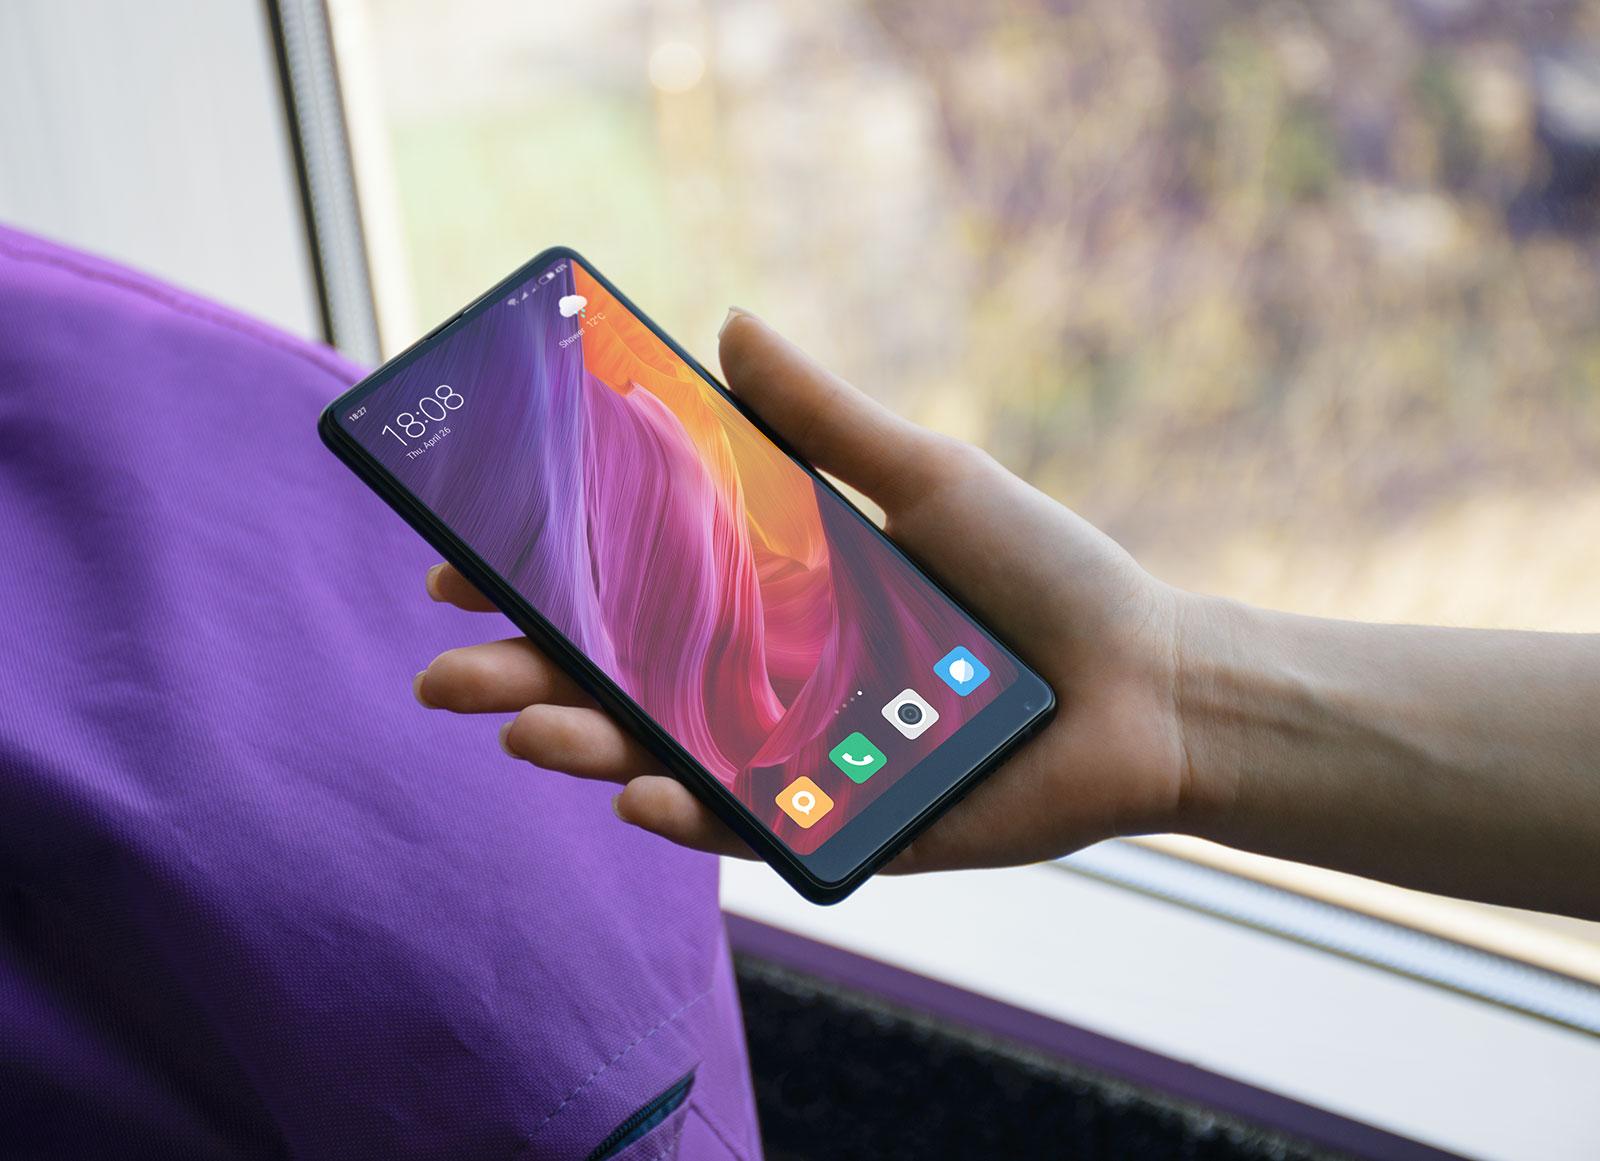 Free-Xiaomi-Mi-Mix-2-Mobile-Phone-in-Female-Hand-Mockup-PSD-4